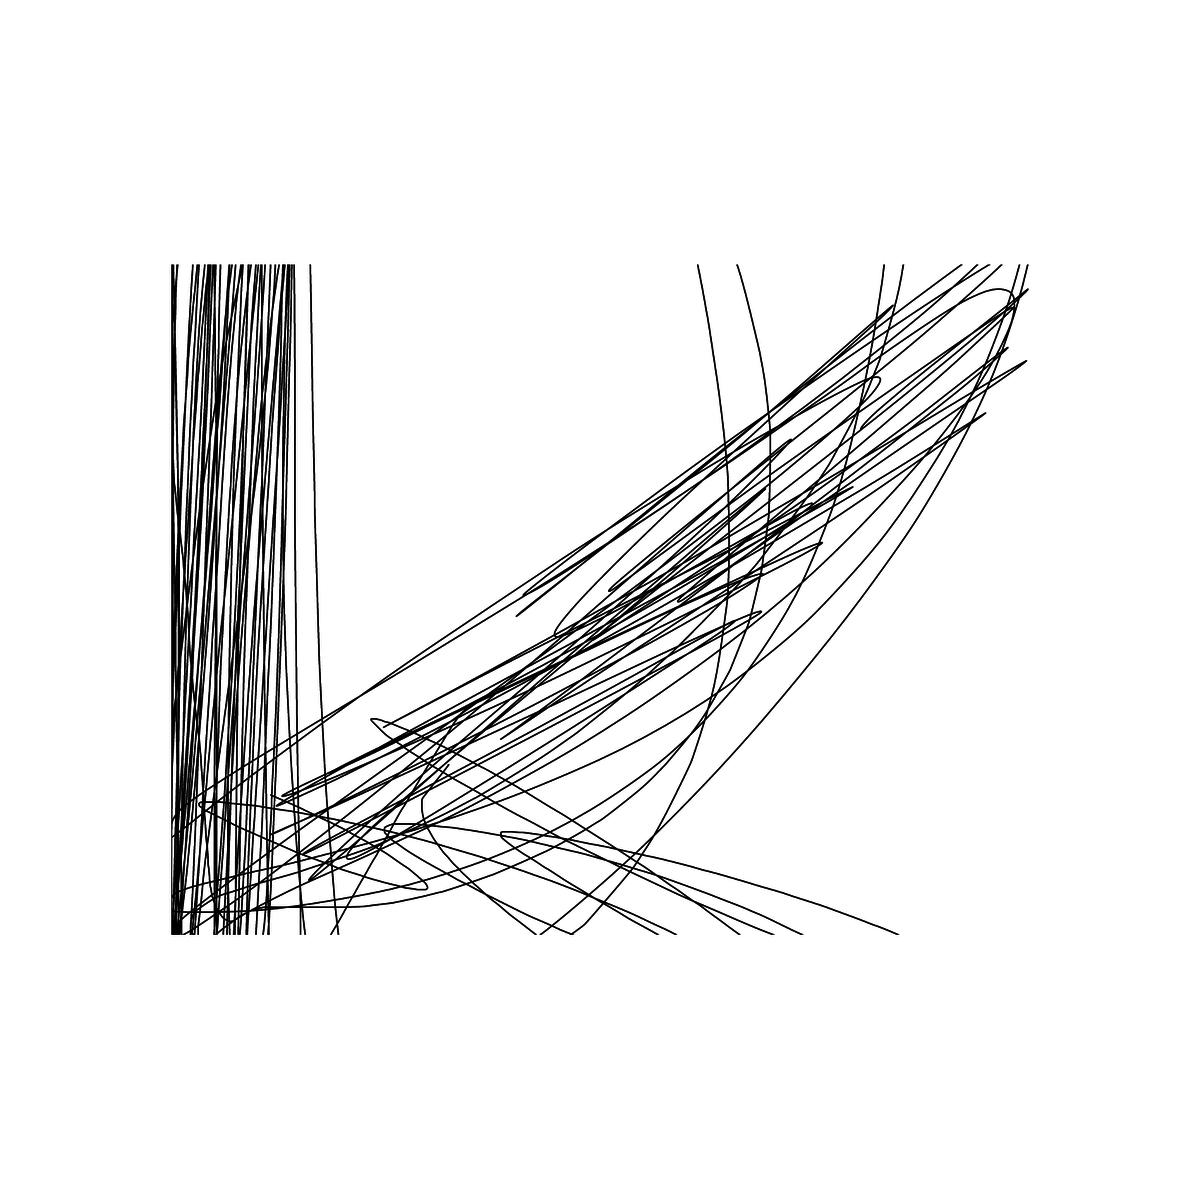 BAAAM drawing#22932 lat:51.5008888244628900lng: -0.1234637796878815